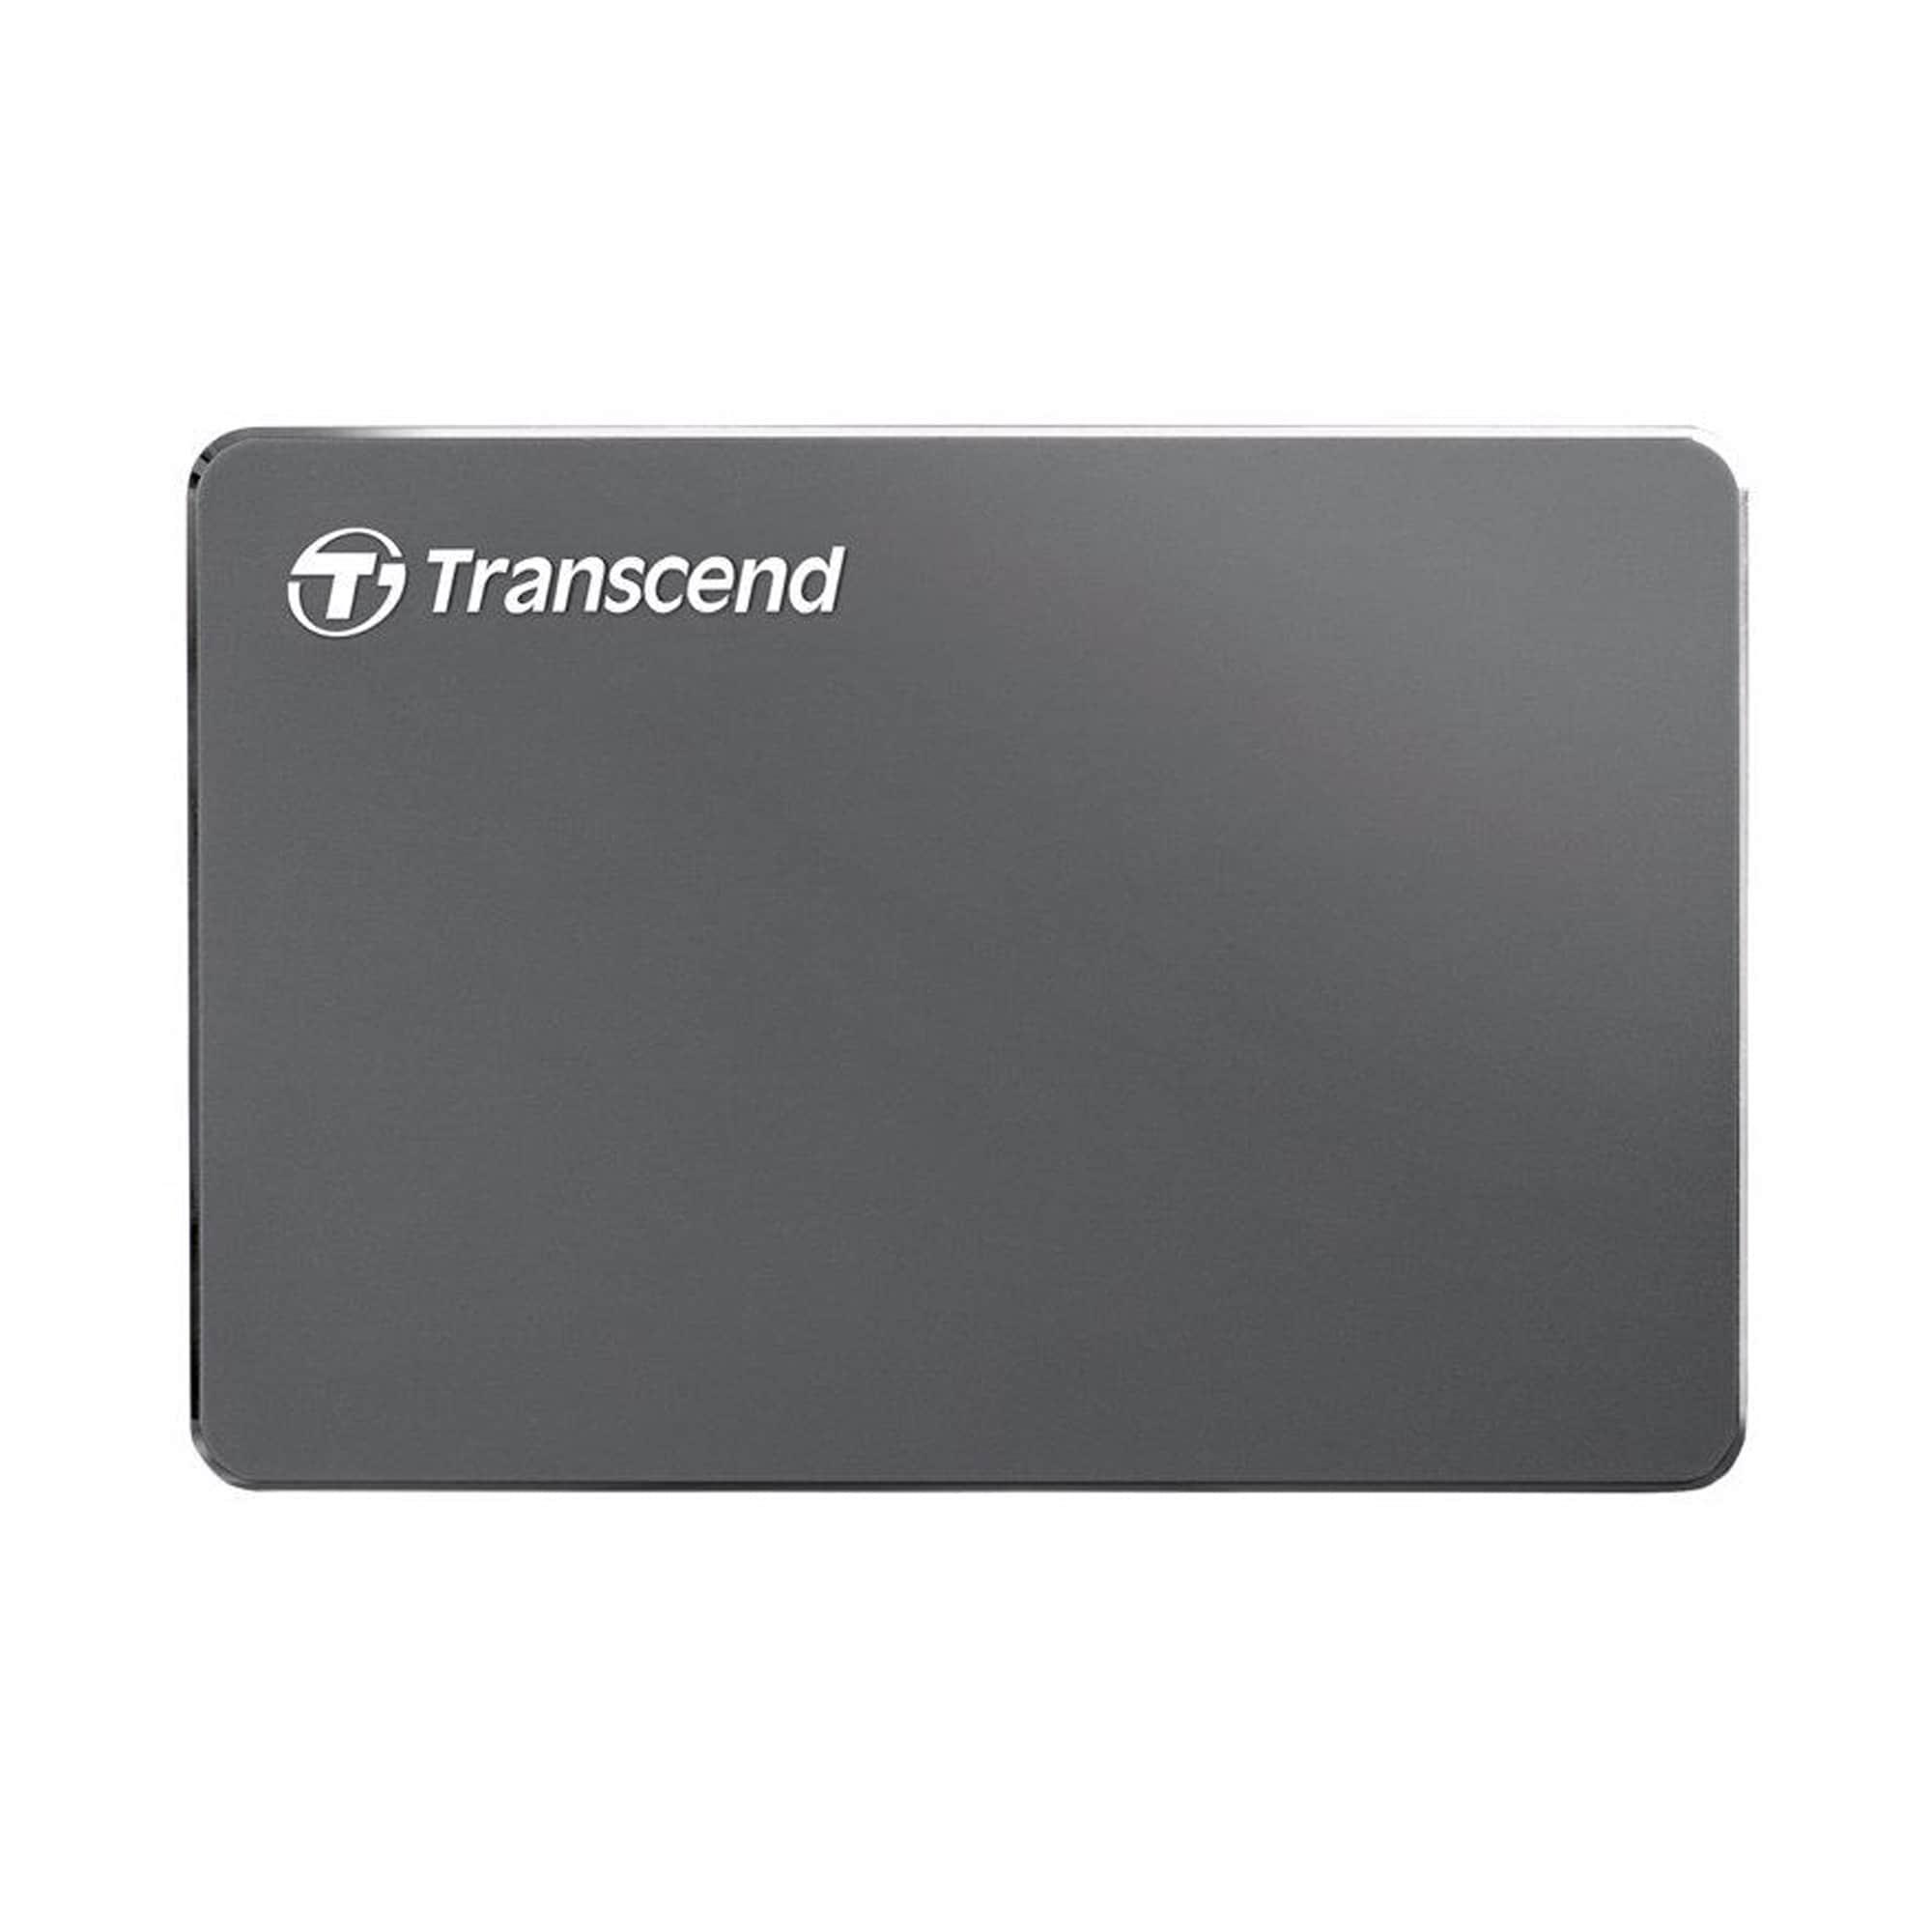 Transcend Storejet 25C3 Extra Slim HDD USB 3.1 1TB